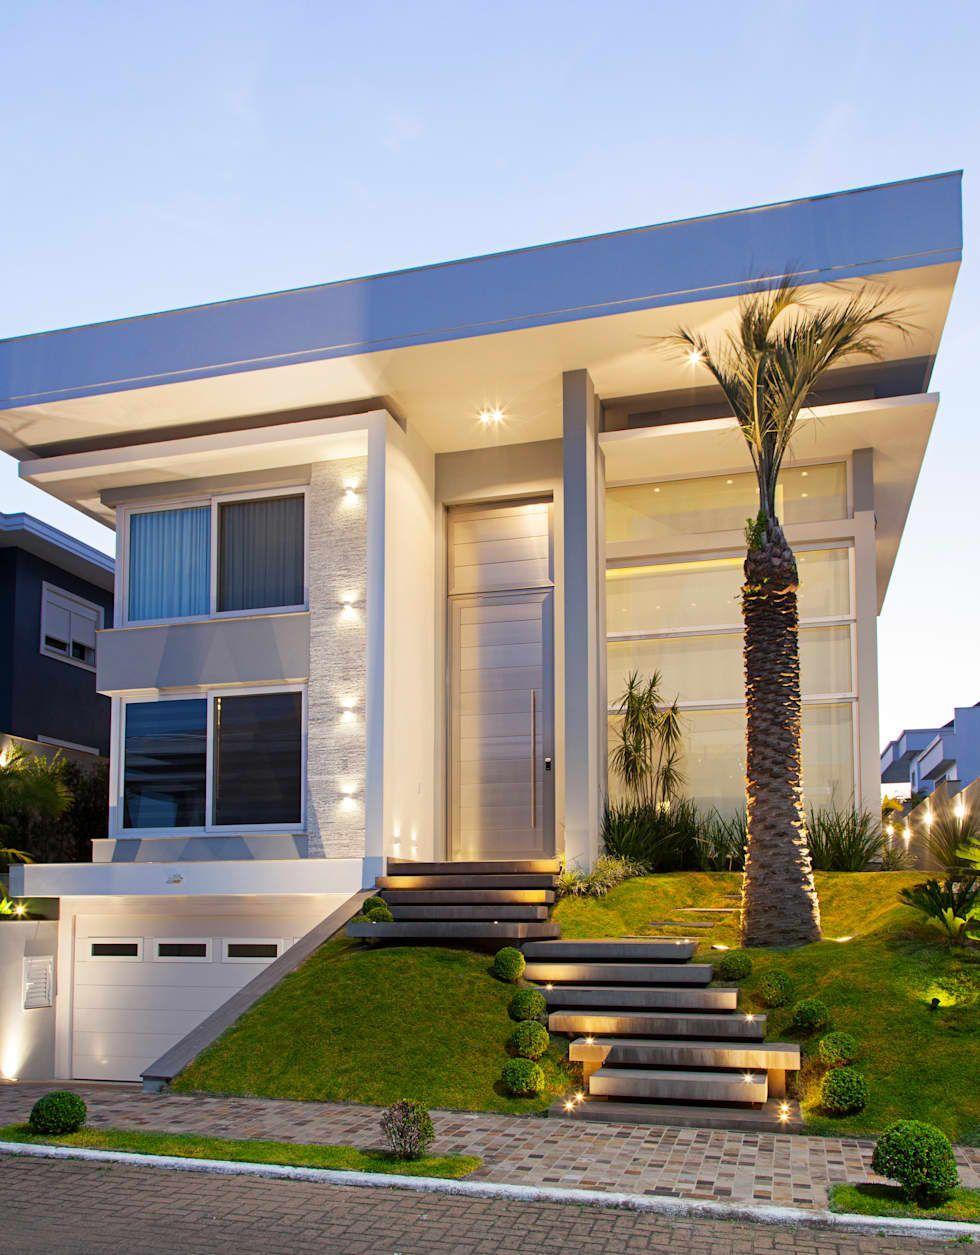 Fachada casas por andr pacheco arquitetura unic rnio for Fachadas de casas ultramodernas